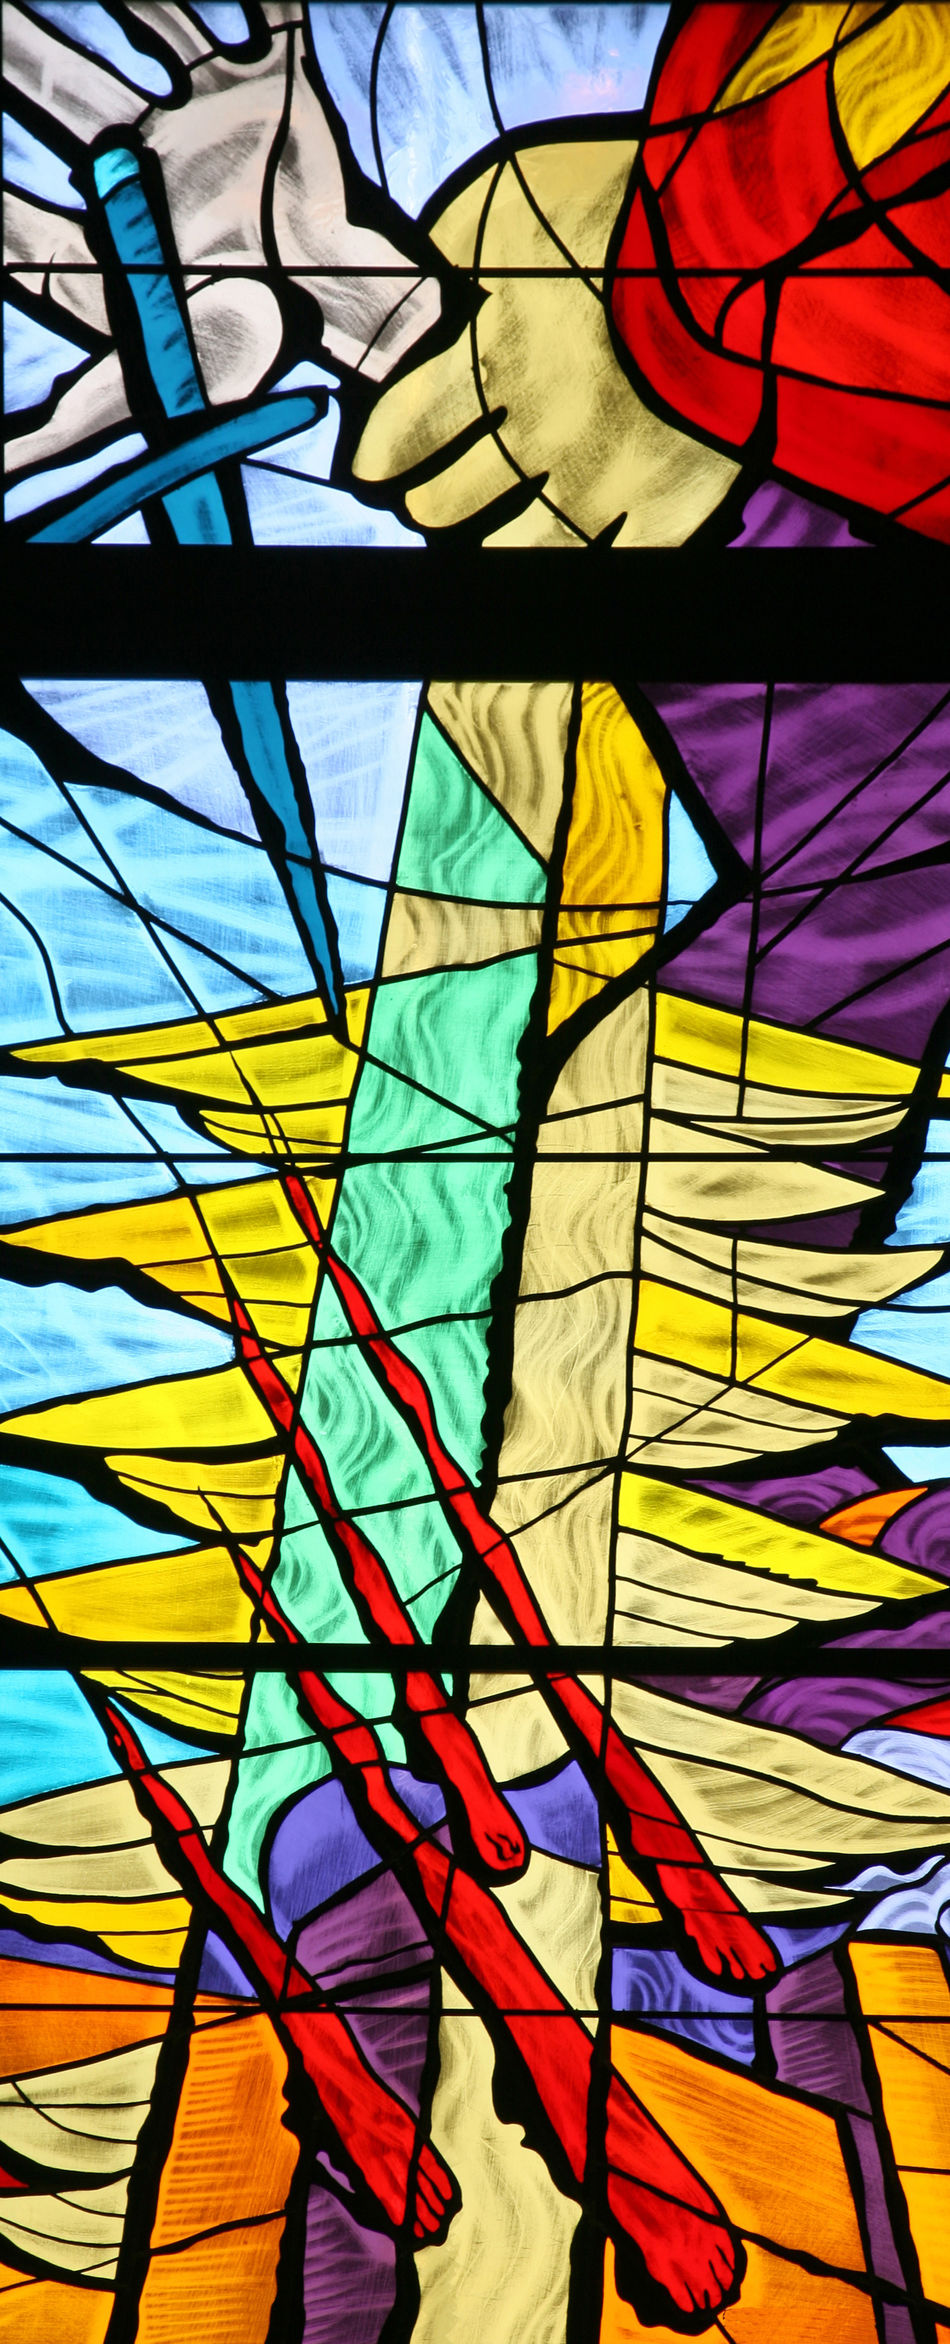 Jacob Abbey Belief Christianity Church Convent Faith Glass Holy Jacob Multi Colored Patron Religion Religious  Sacred Saint Spiritual Stained Window Windowpane Worship